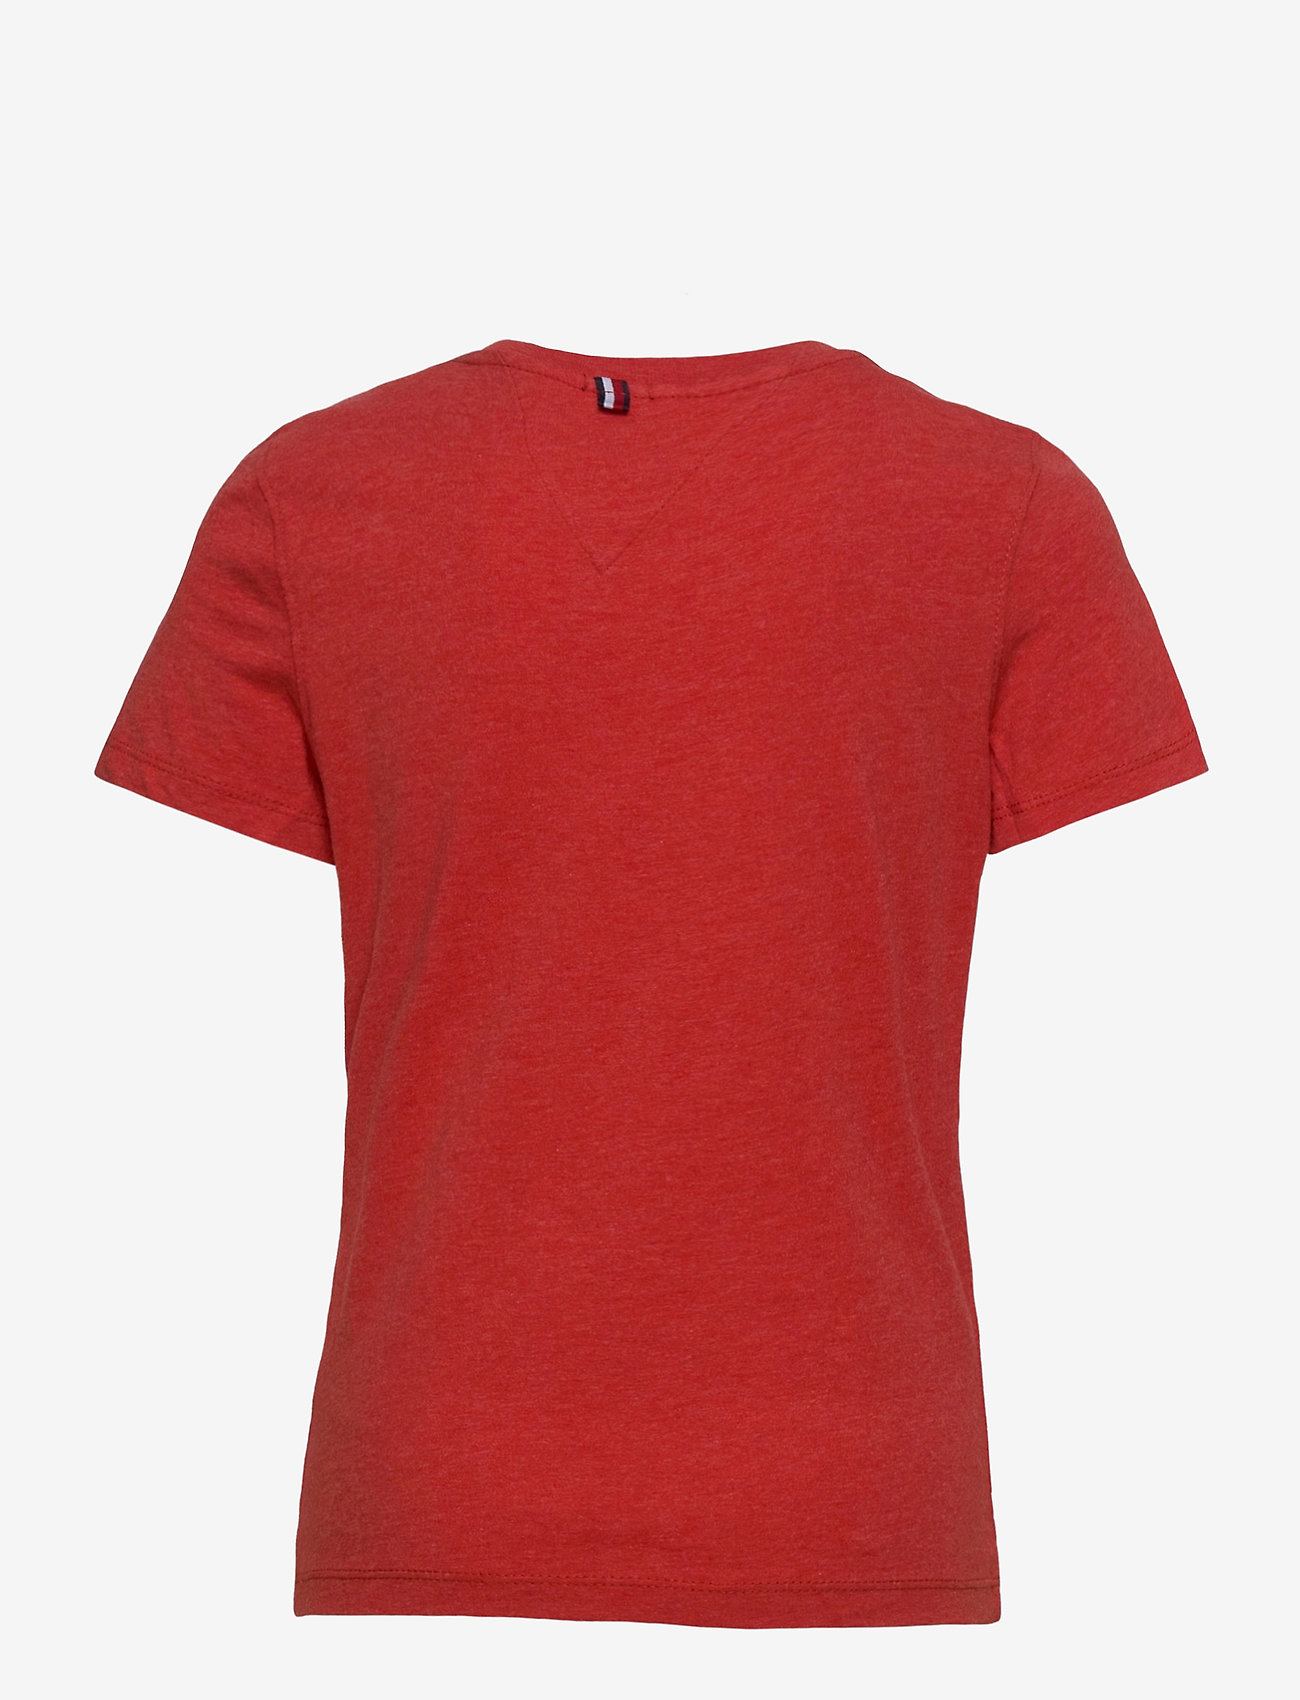 Tommy Hilfiger - BOYS BASIC CN KNIT S - short-sleeved - apple red heather - 1